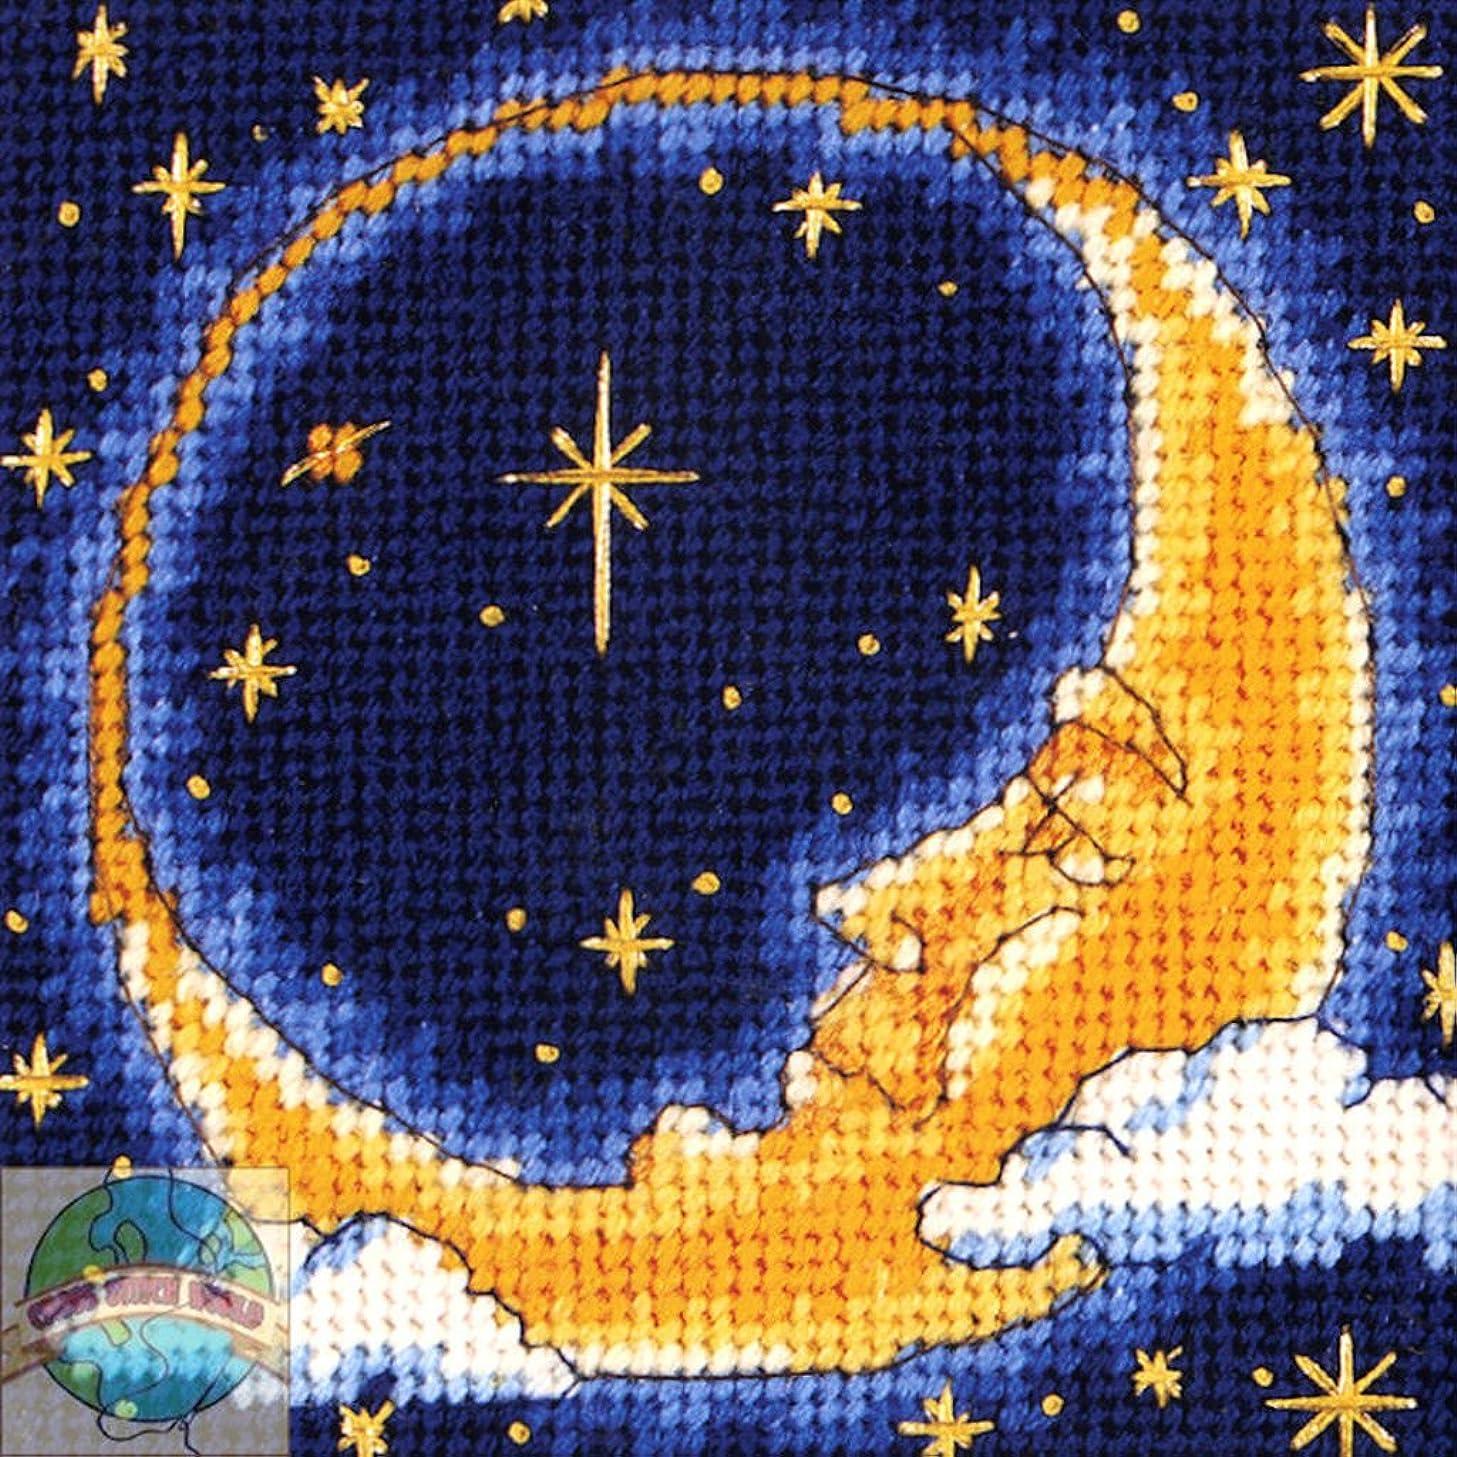 Cresent Moon Chunky Cross Stitch Needlepoint Kit Vervaco 16